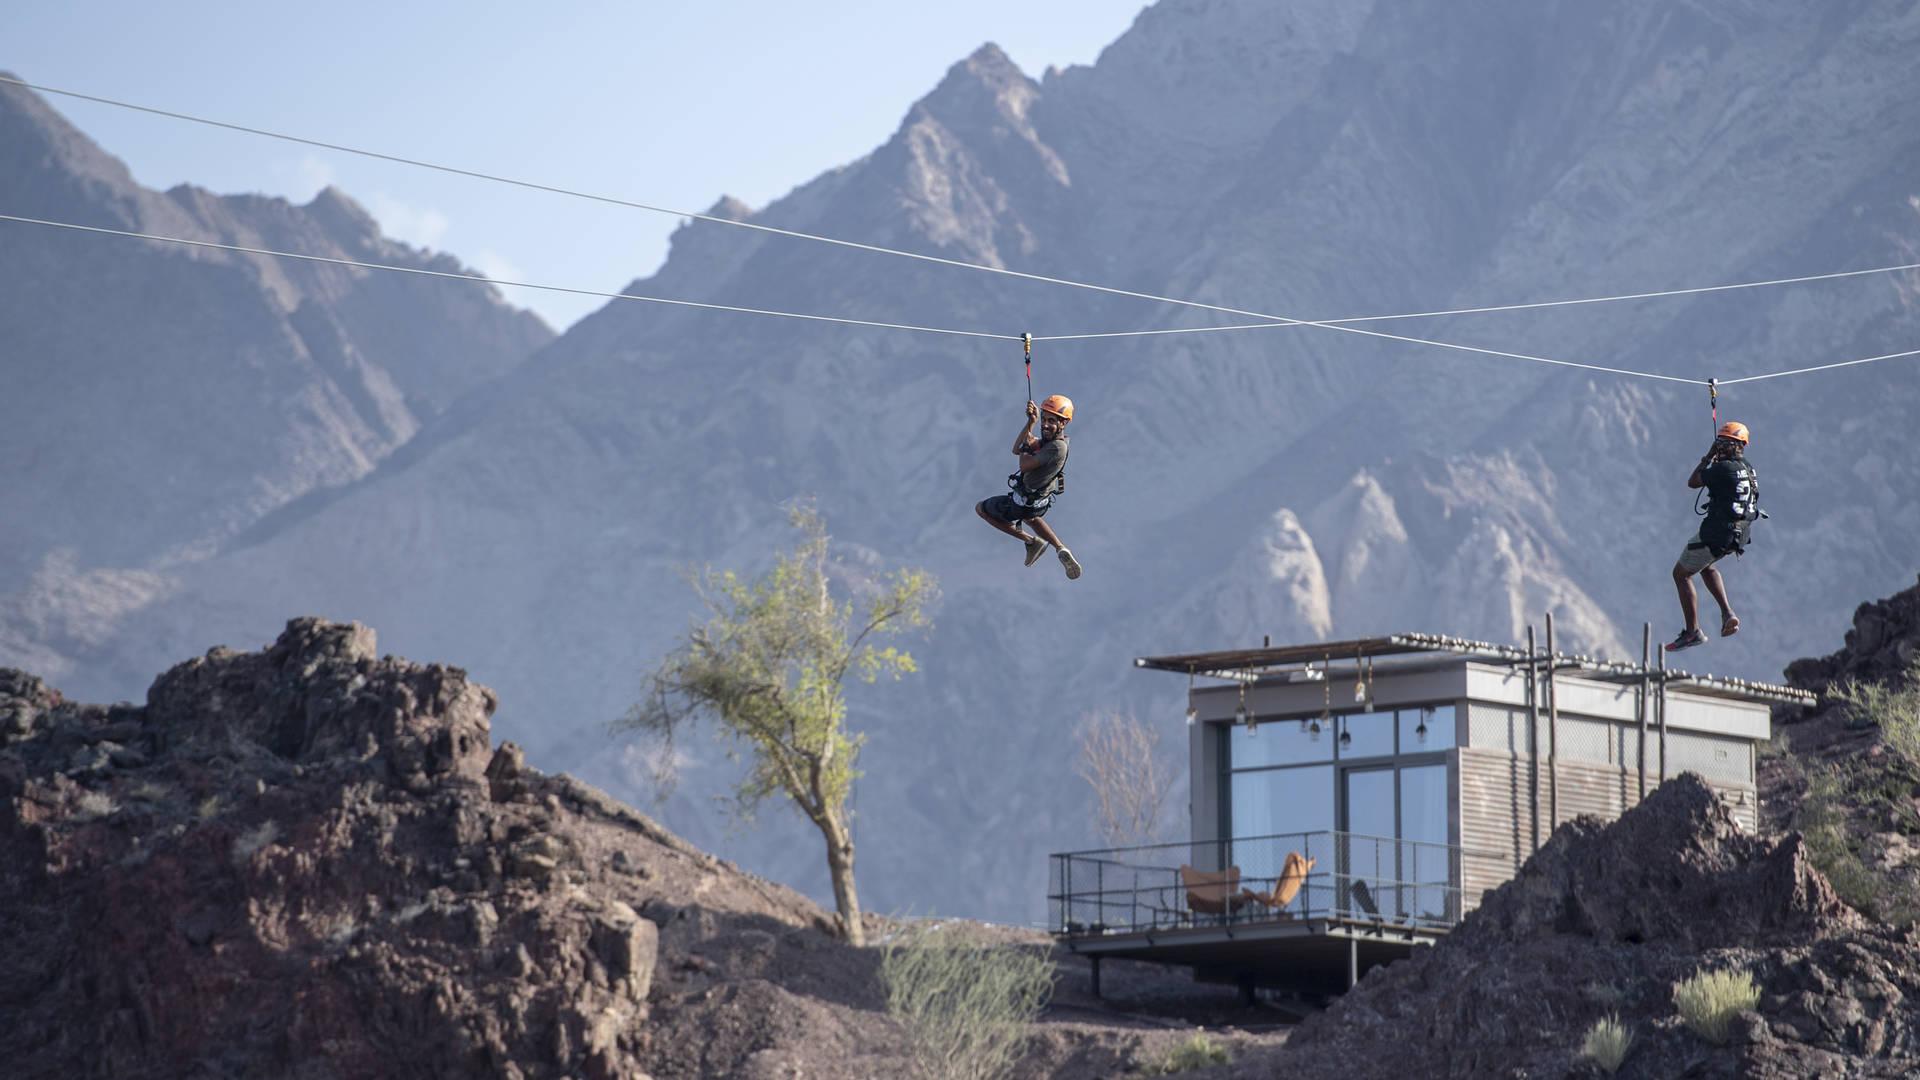 Zip-lining at hatta wadi hub jumeirah dubai